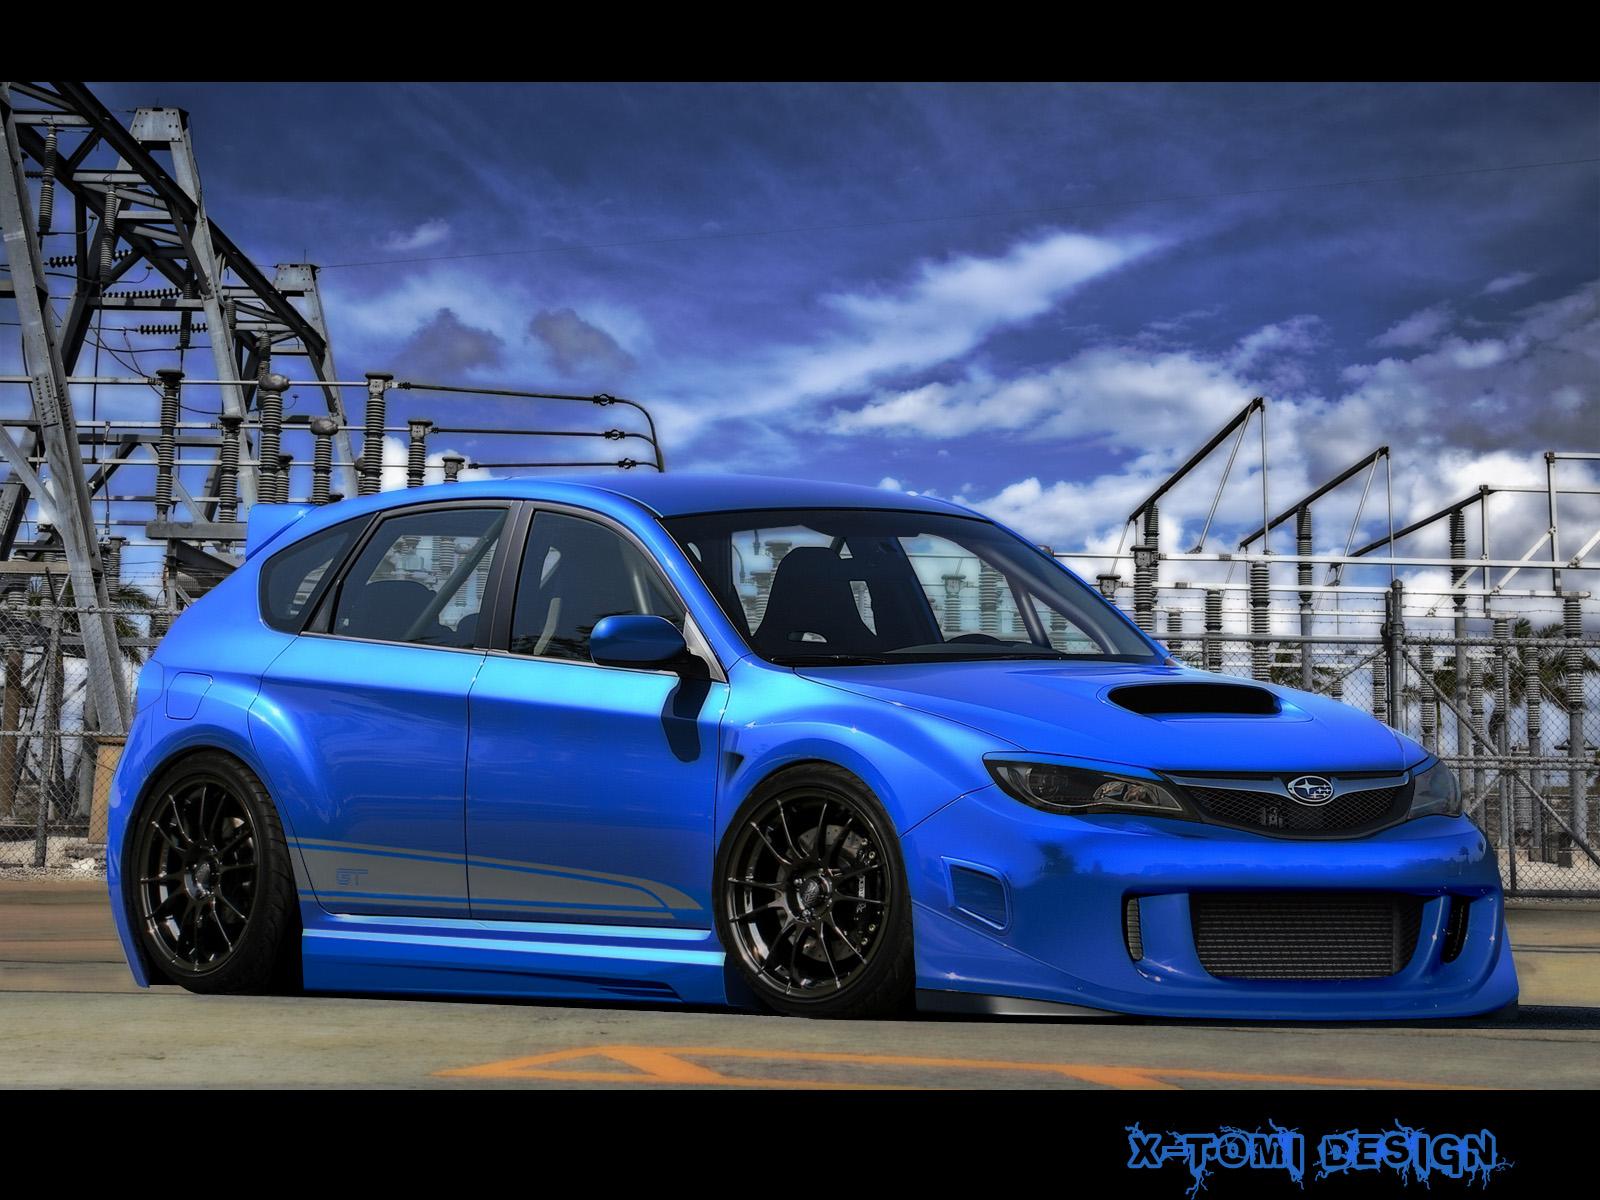 Subaru Impreza Wrx Sti Effekt